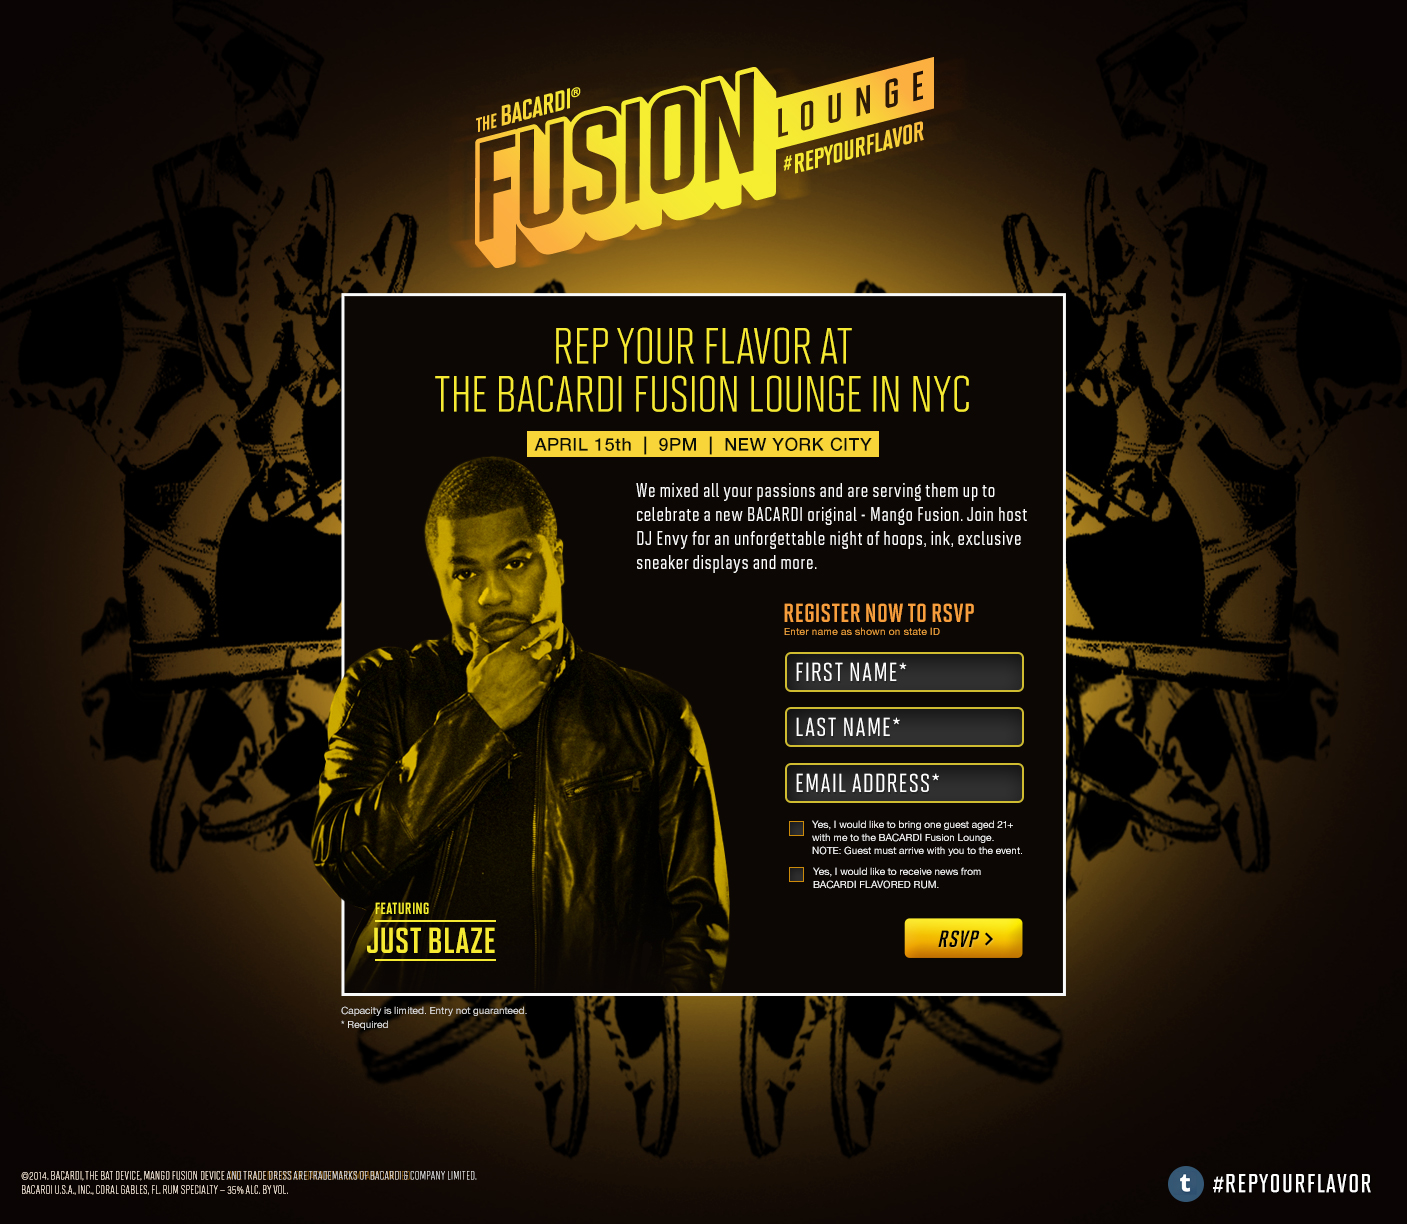 Fusion_Lounge_RSVP_Site_RSVP.jpg